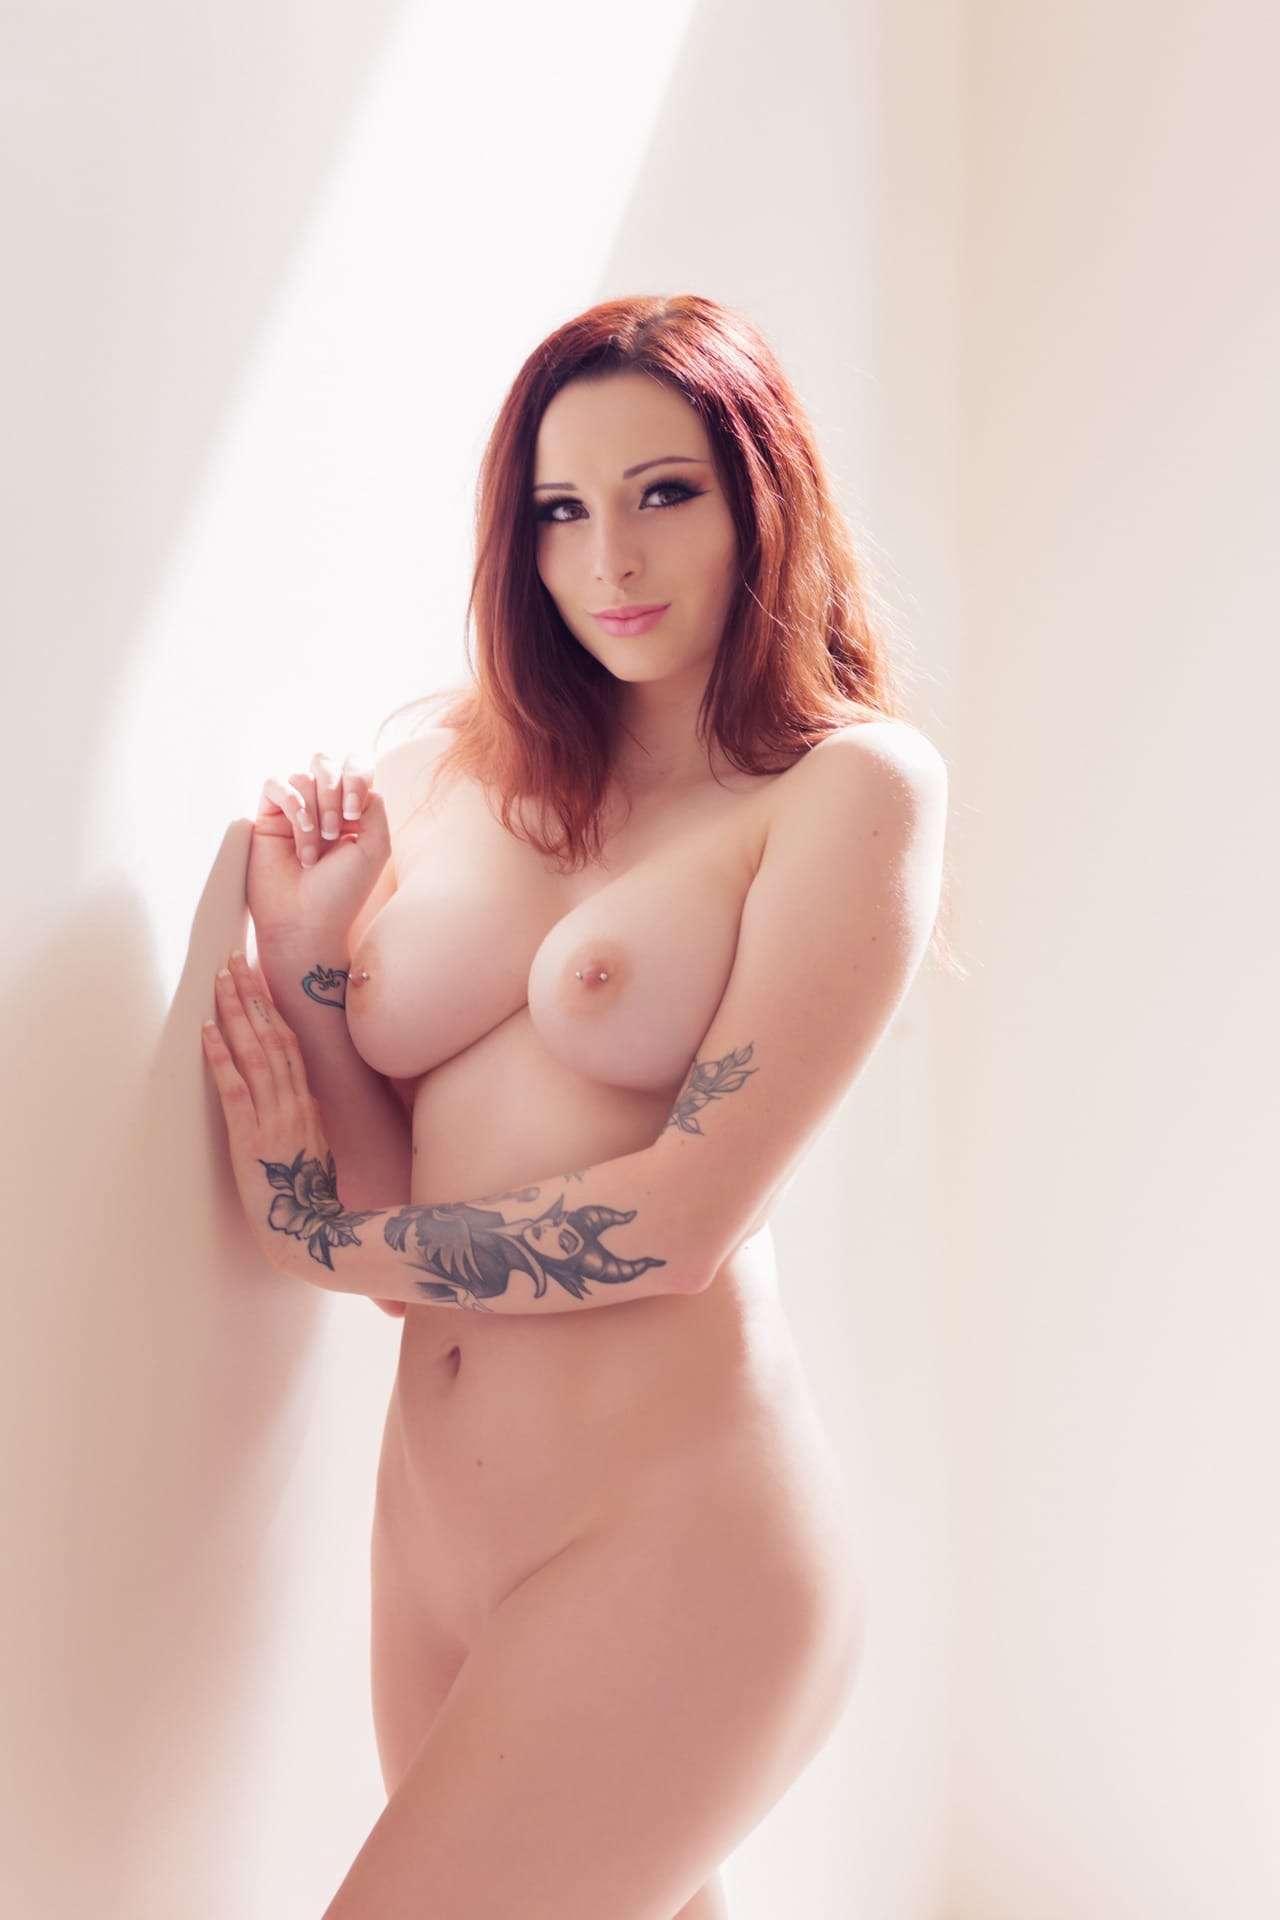 Erin brittany nude